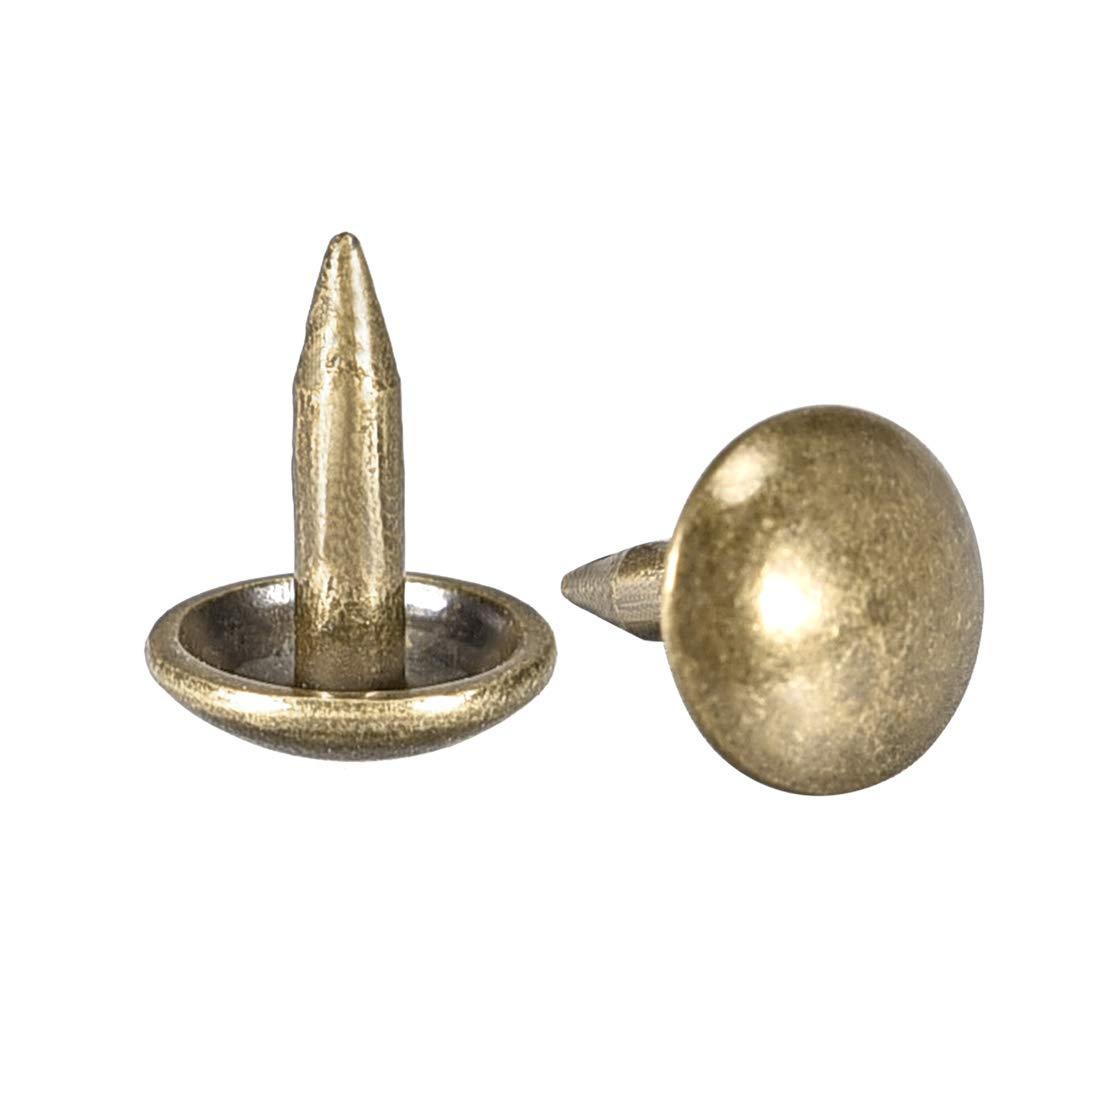 Upholstery Nails Tacks 8mm Head Dia Round Thumb Push Pins Bronze Tone 100 Pcs